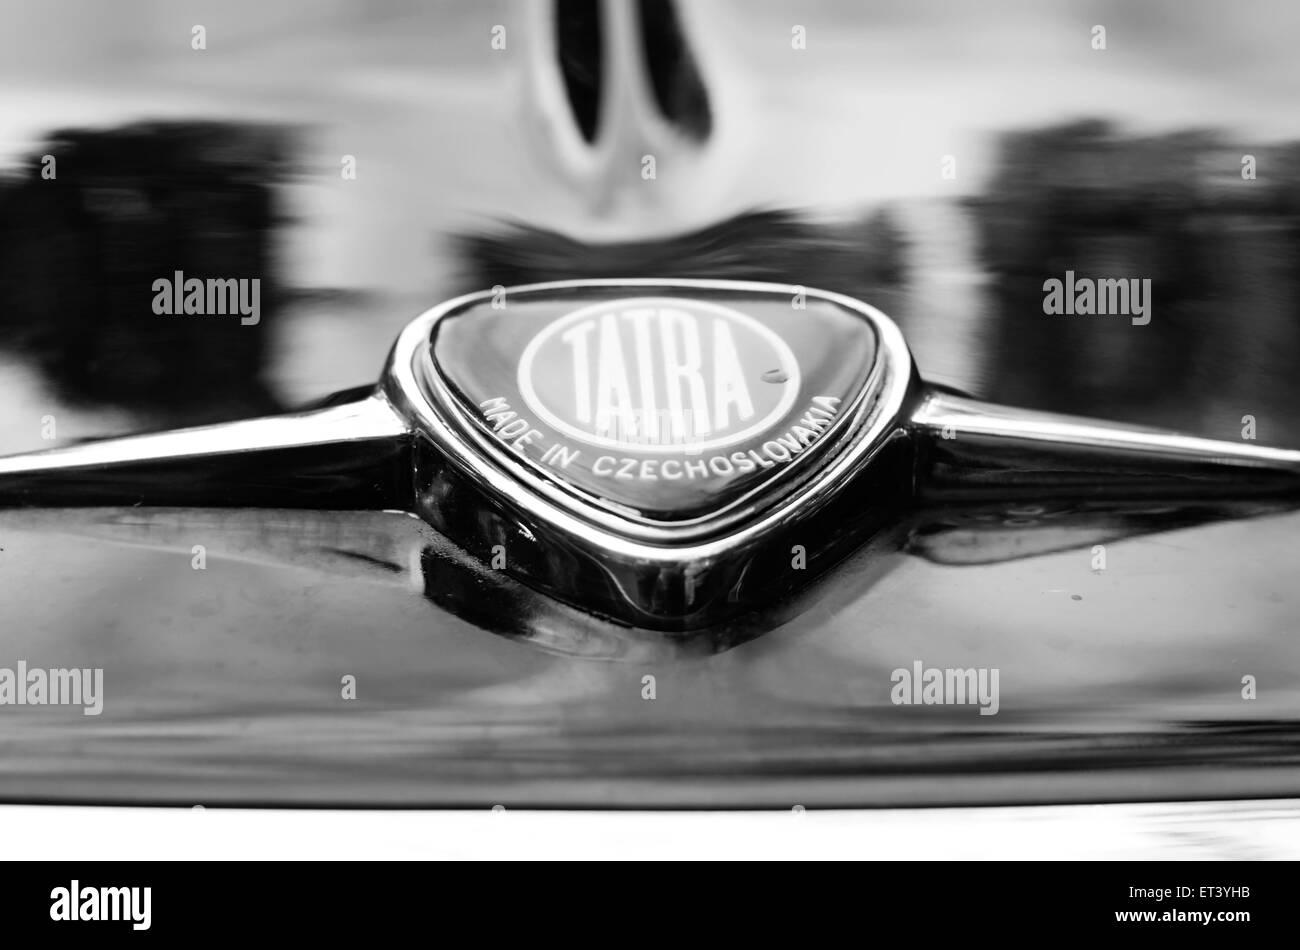 Vintage car logo Stock Photo, Royalty Free Image: 83680727 - Alamy